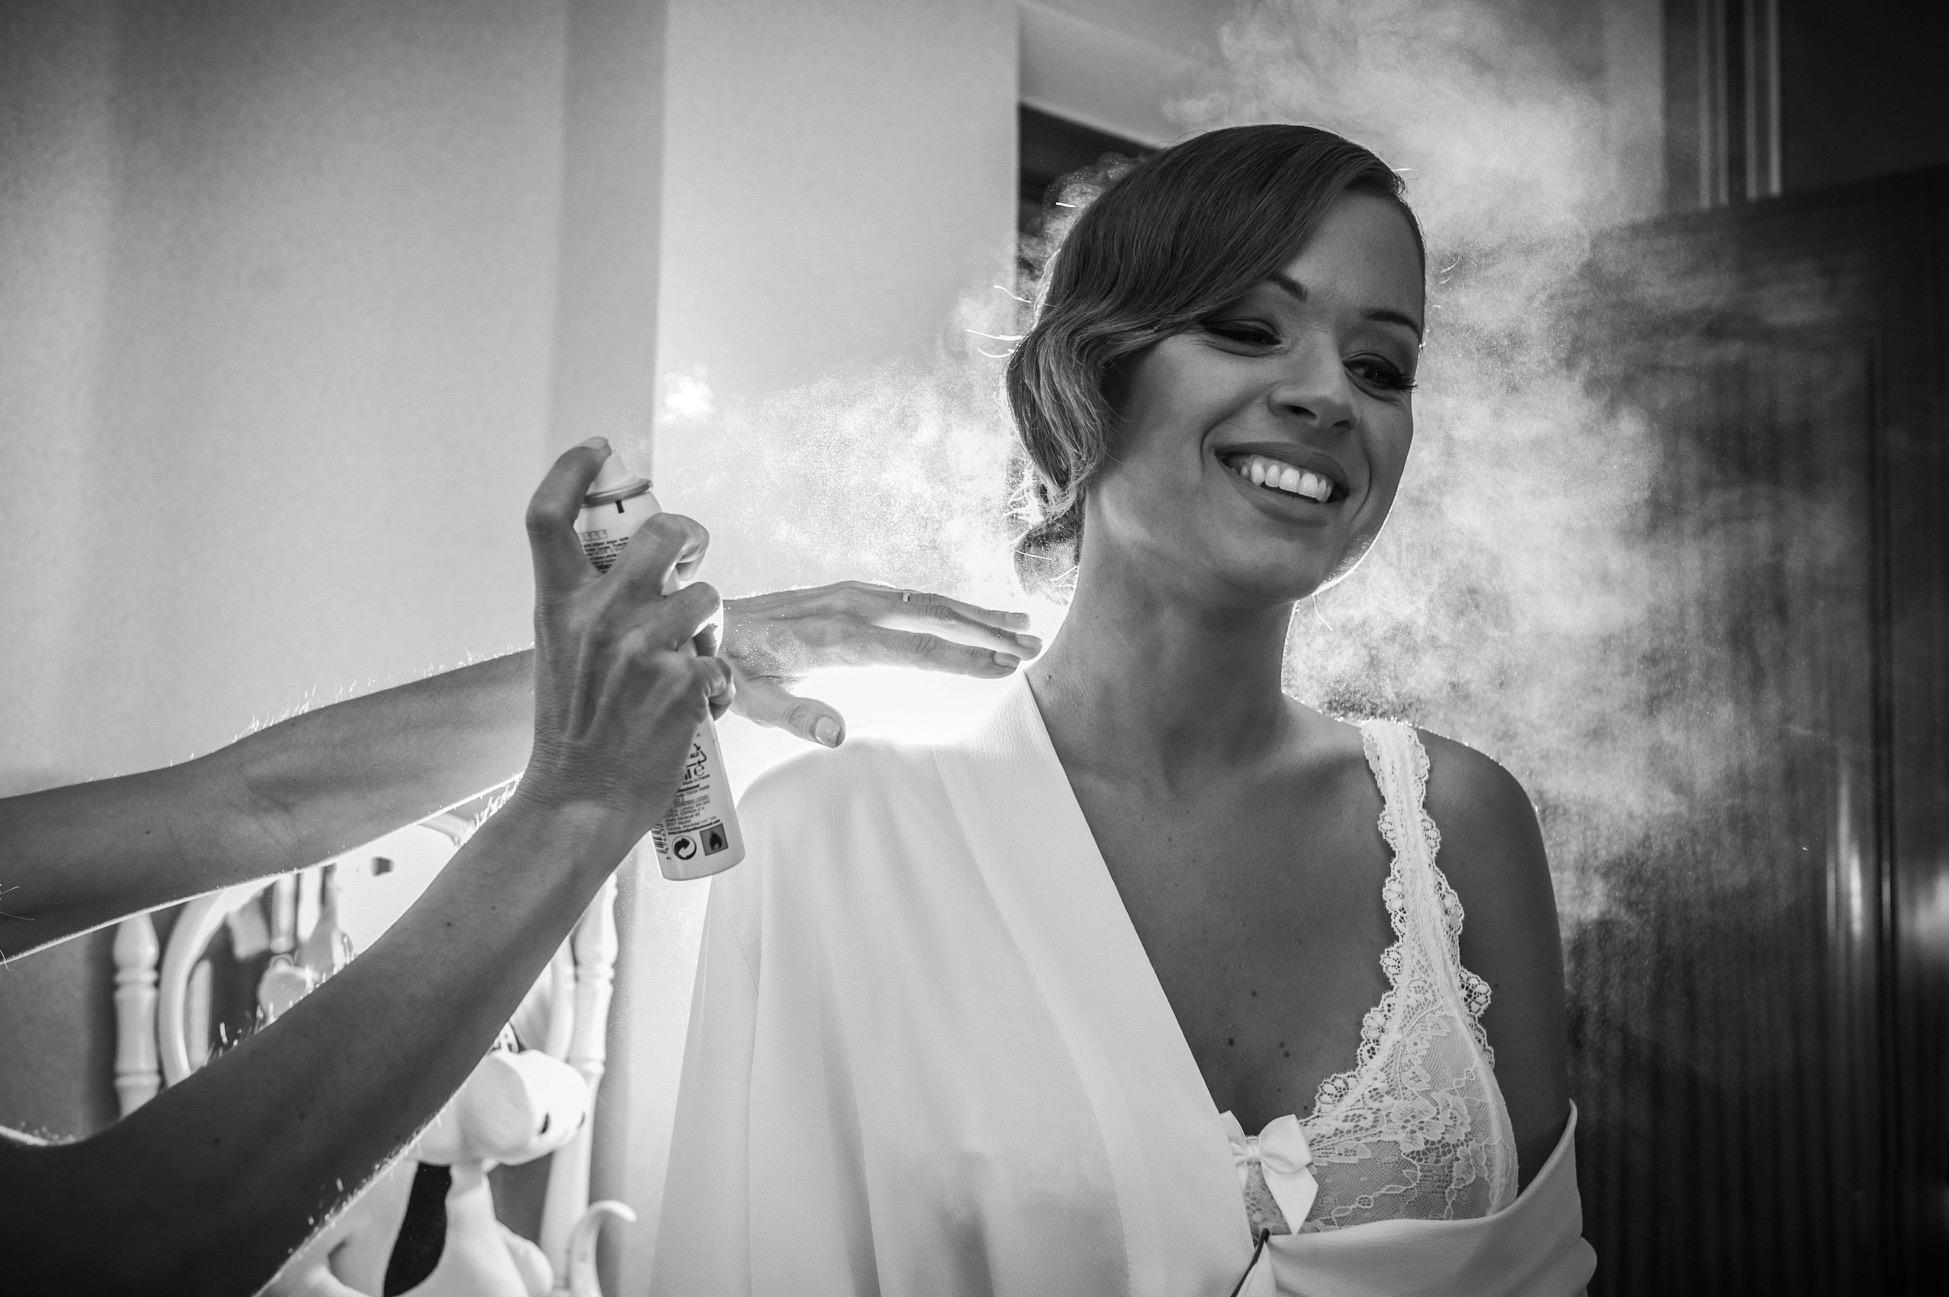 Si-Quiero-Wedding-Planner-By-Sira-Antequera-Virginia-Jose-6